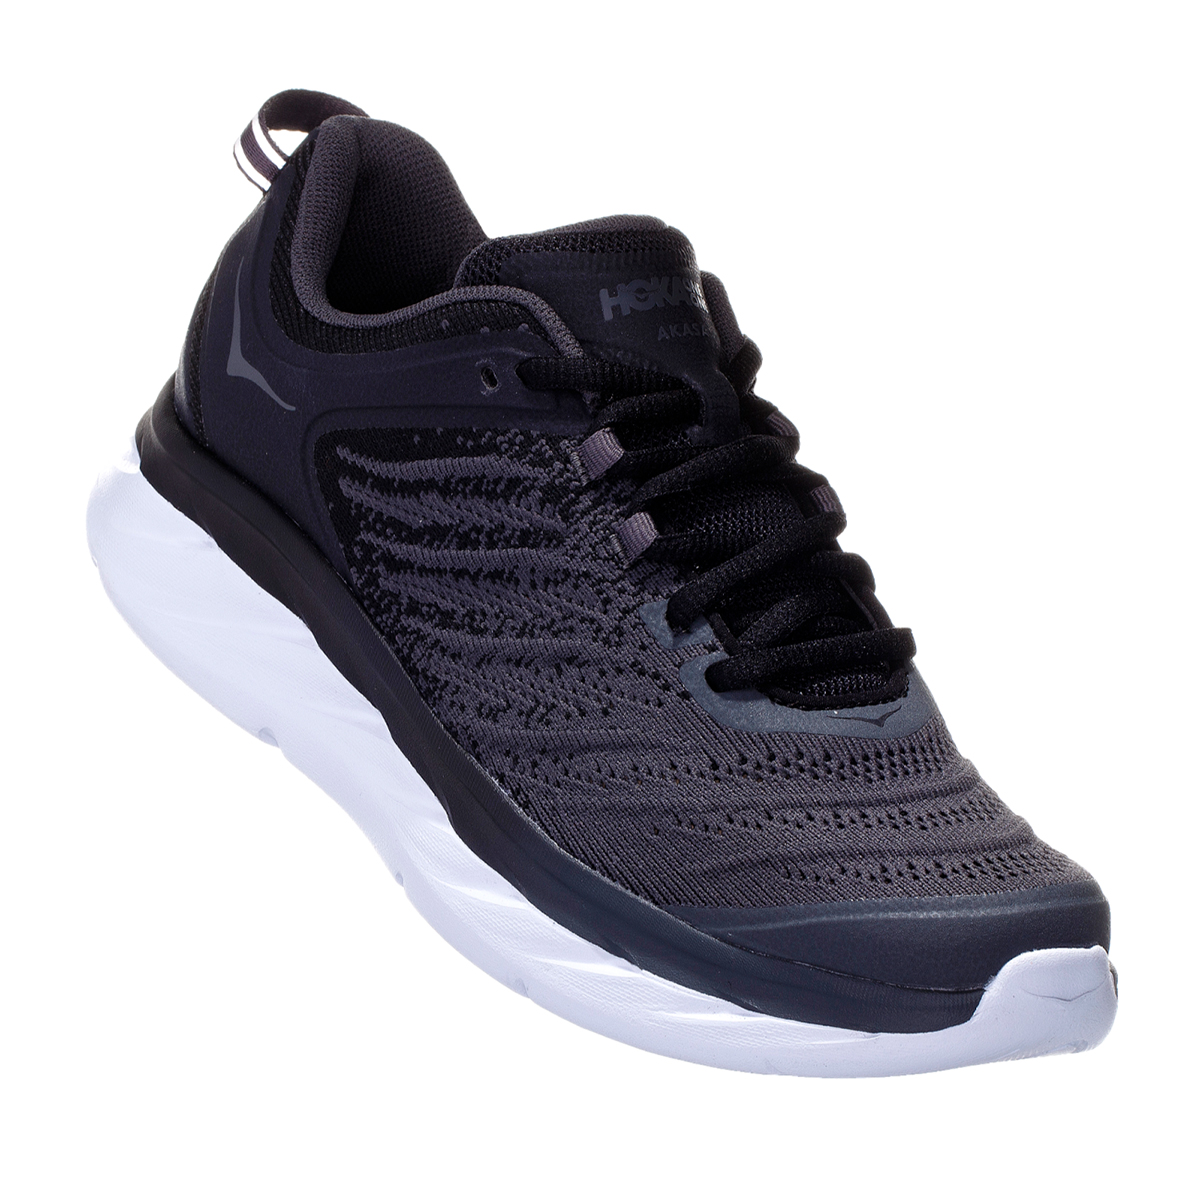 Women's Hoka One One Akasa Running Shoe - Color: Black/Dark Shadow - Size: 5 - Width: Regular, Black/Dark Shadow, large, image 5